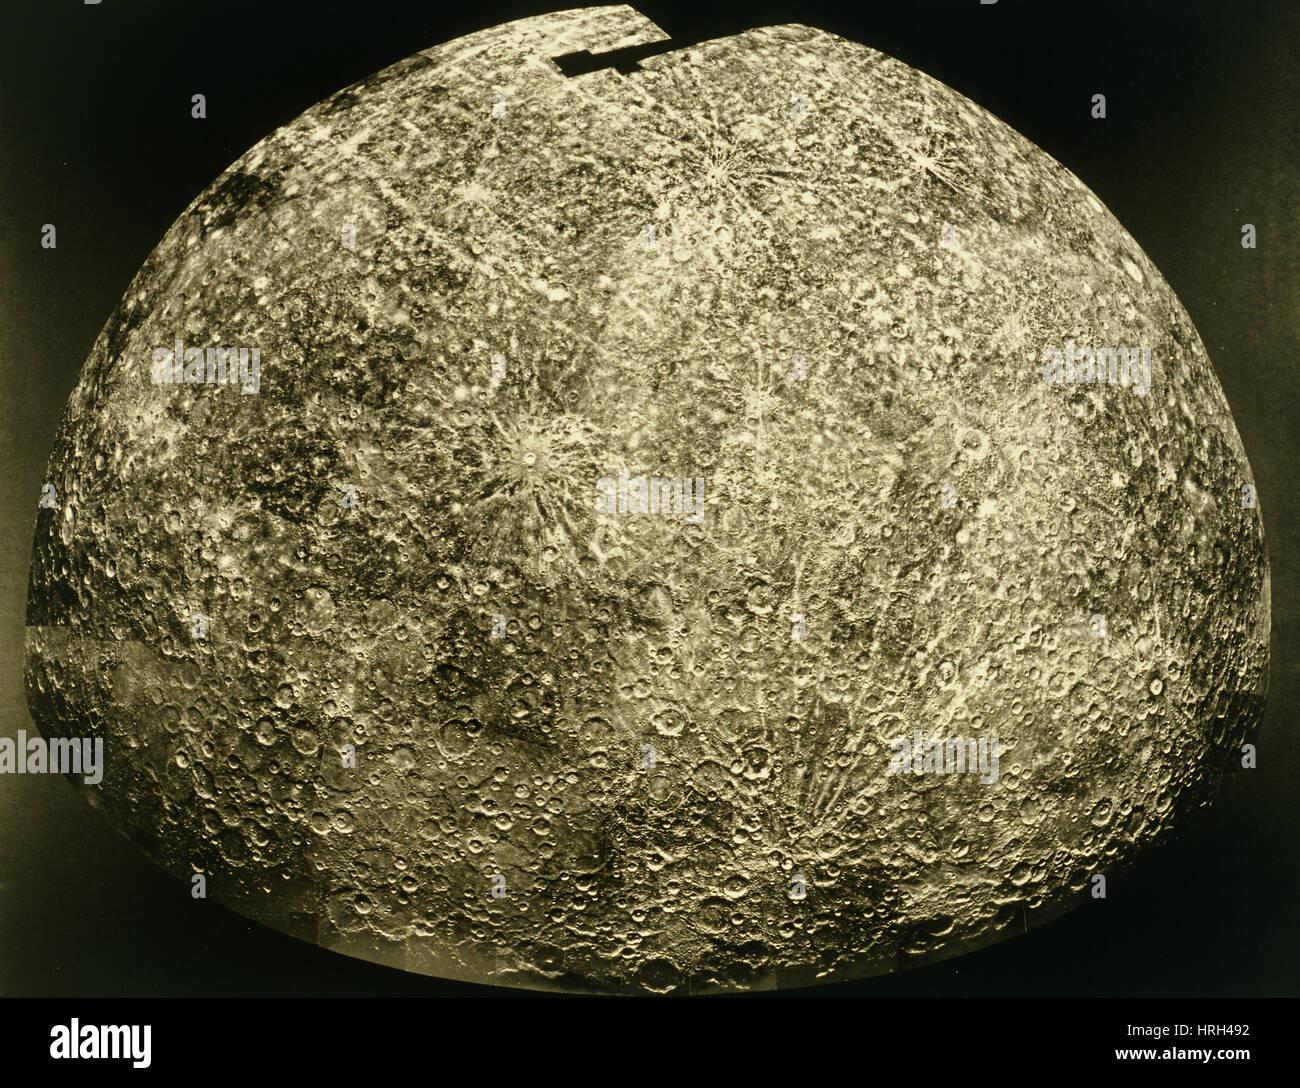 Mercury Mariner 10 Immagine Immagini Stock